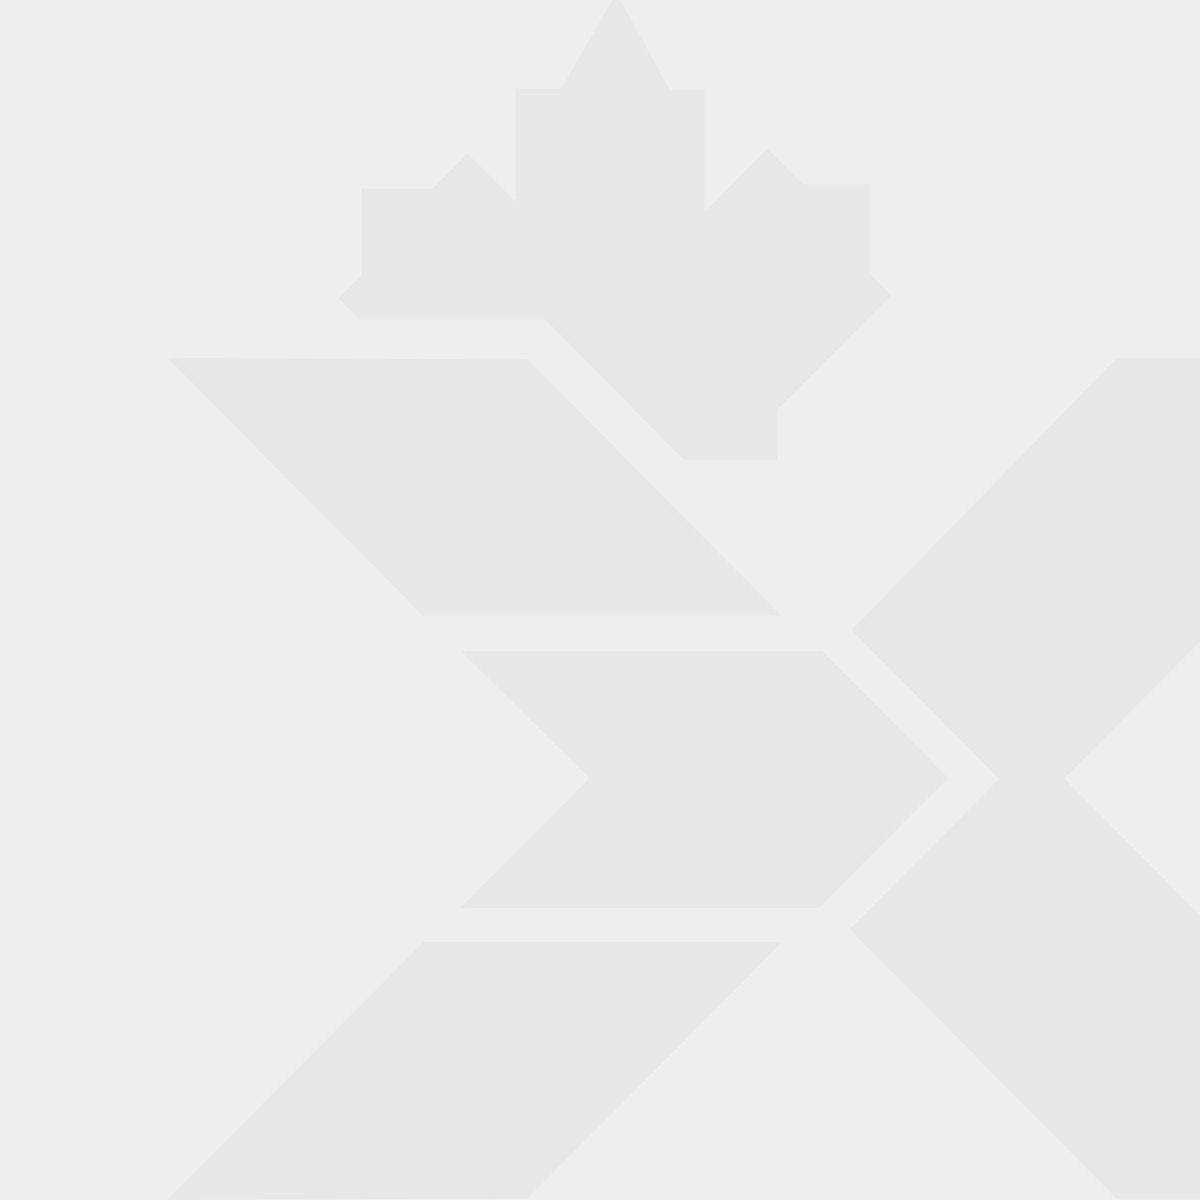 HMCS Winnipeg Vacuum Tumbler